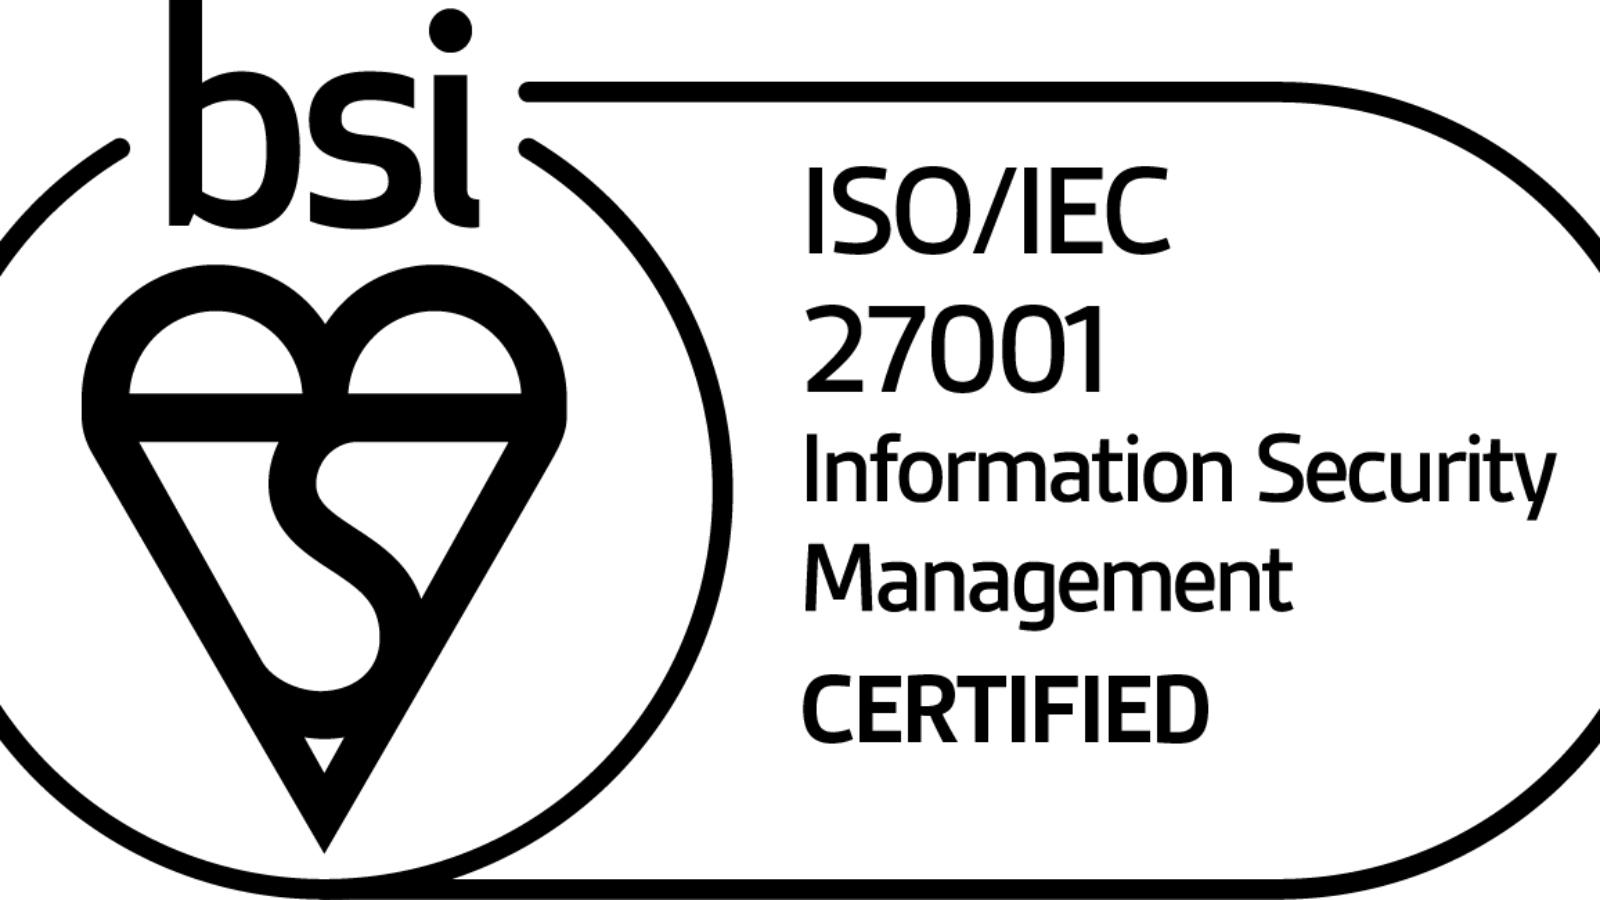 mark-of-trust-certified-ISOIEC-27001-information-security-management-black-logo-En-GB-1019